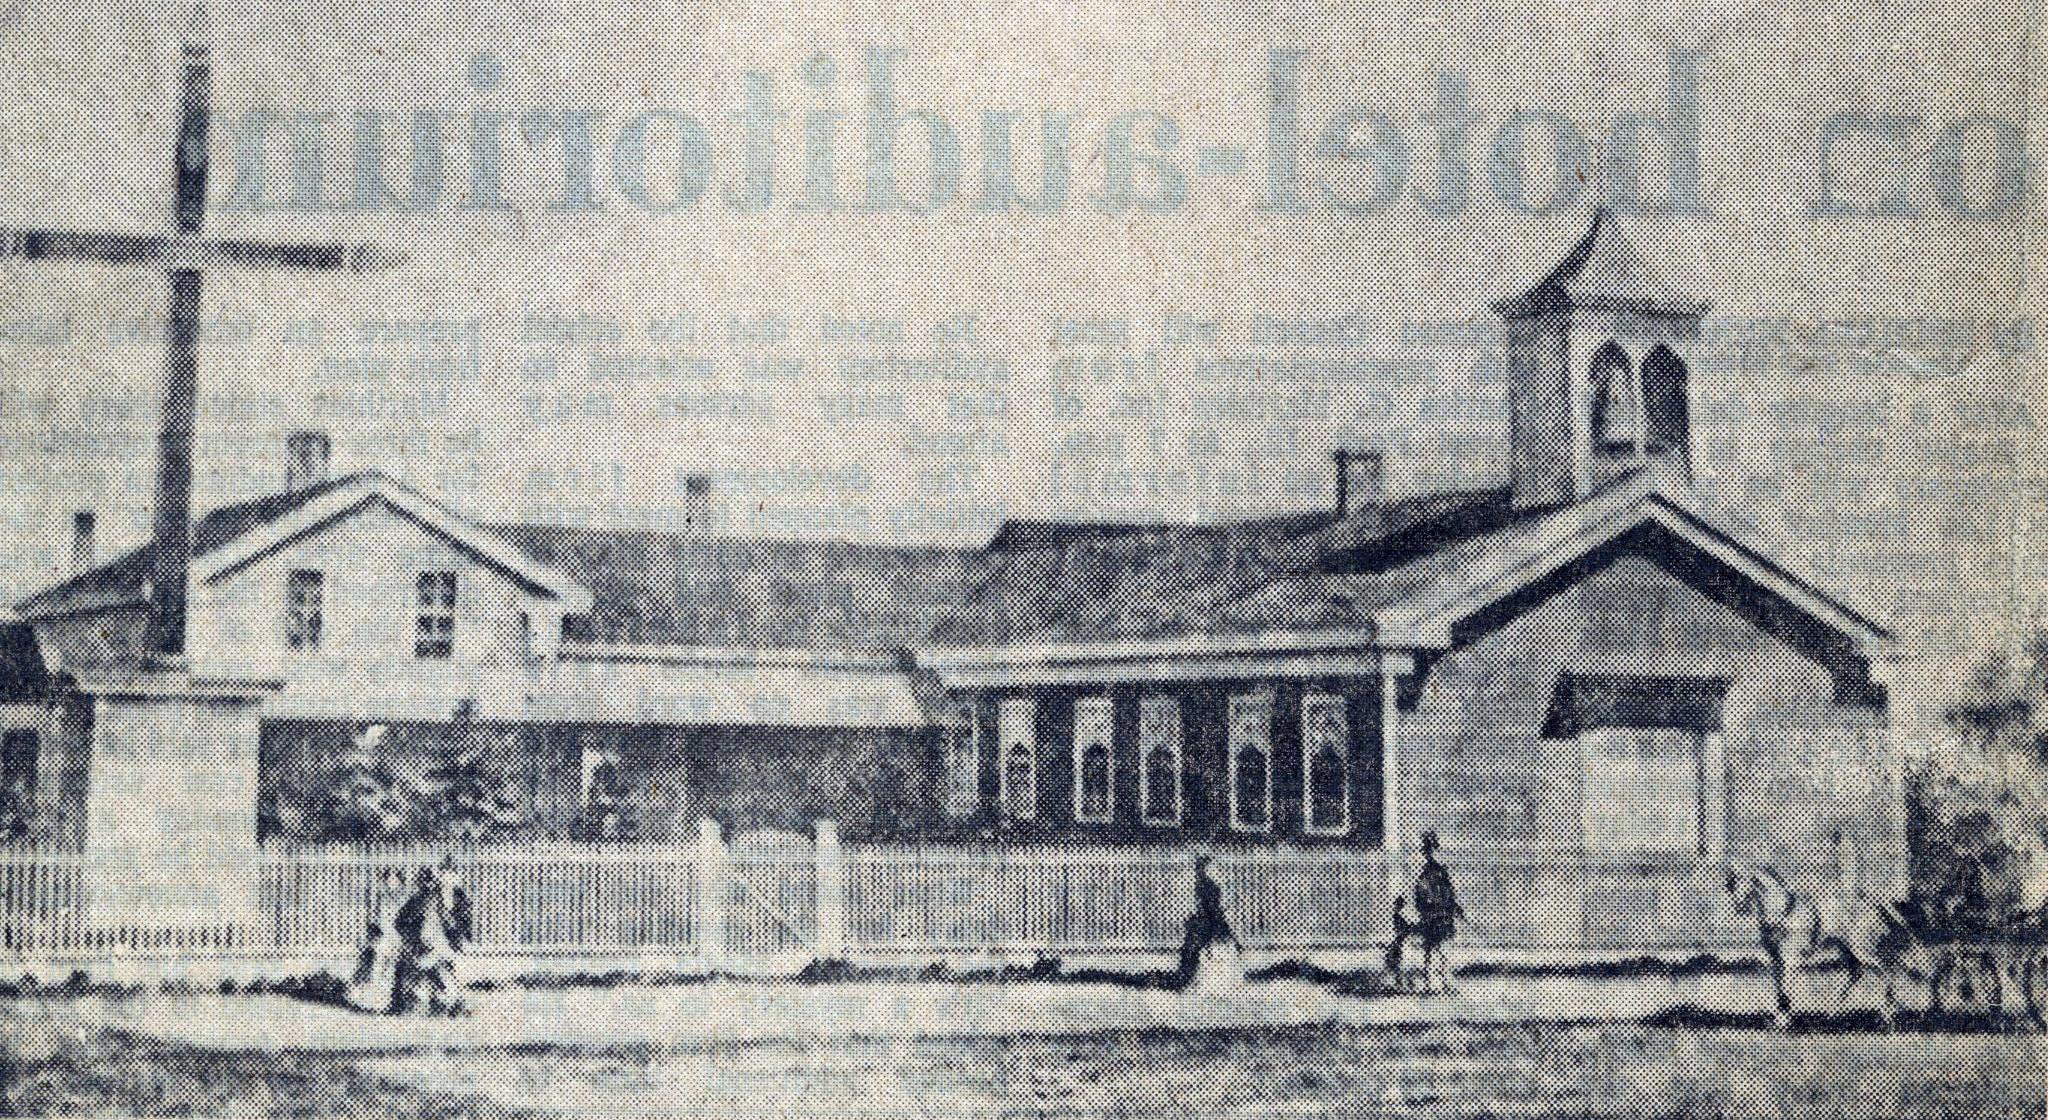 Artist's rendering of St. Louis Chapel, later renamed St. Joseph's Church, c. 1860s.